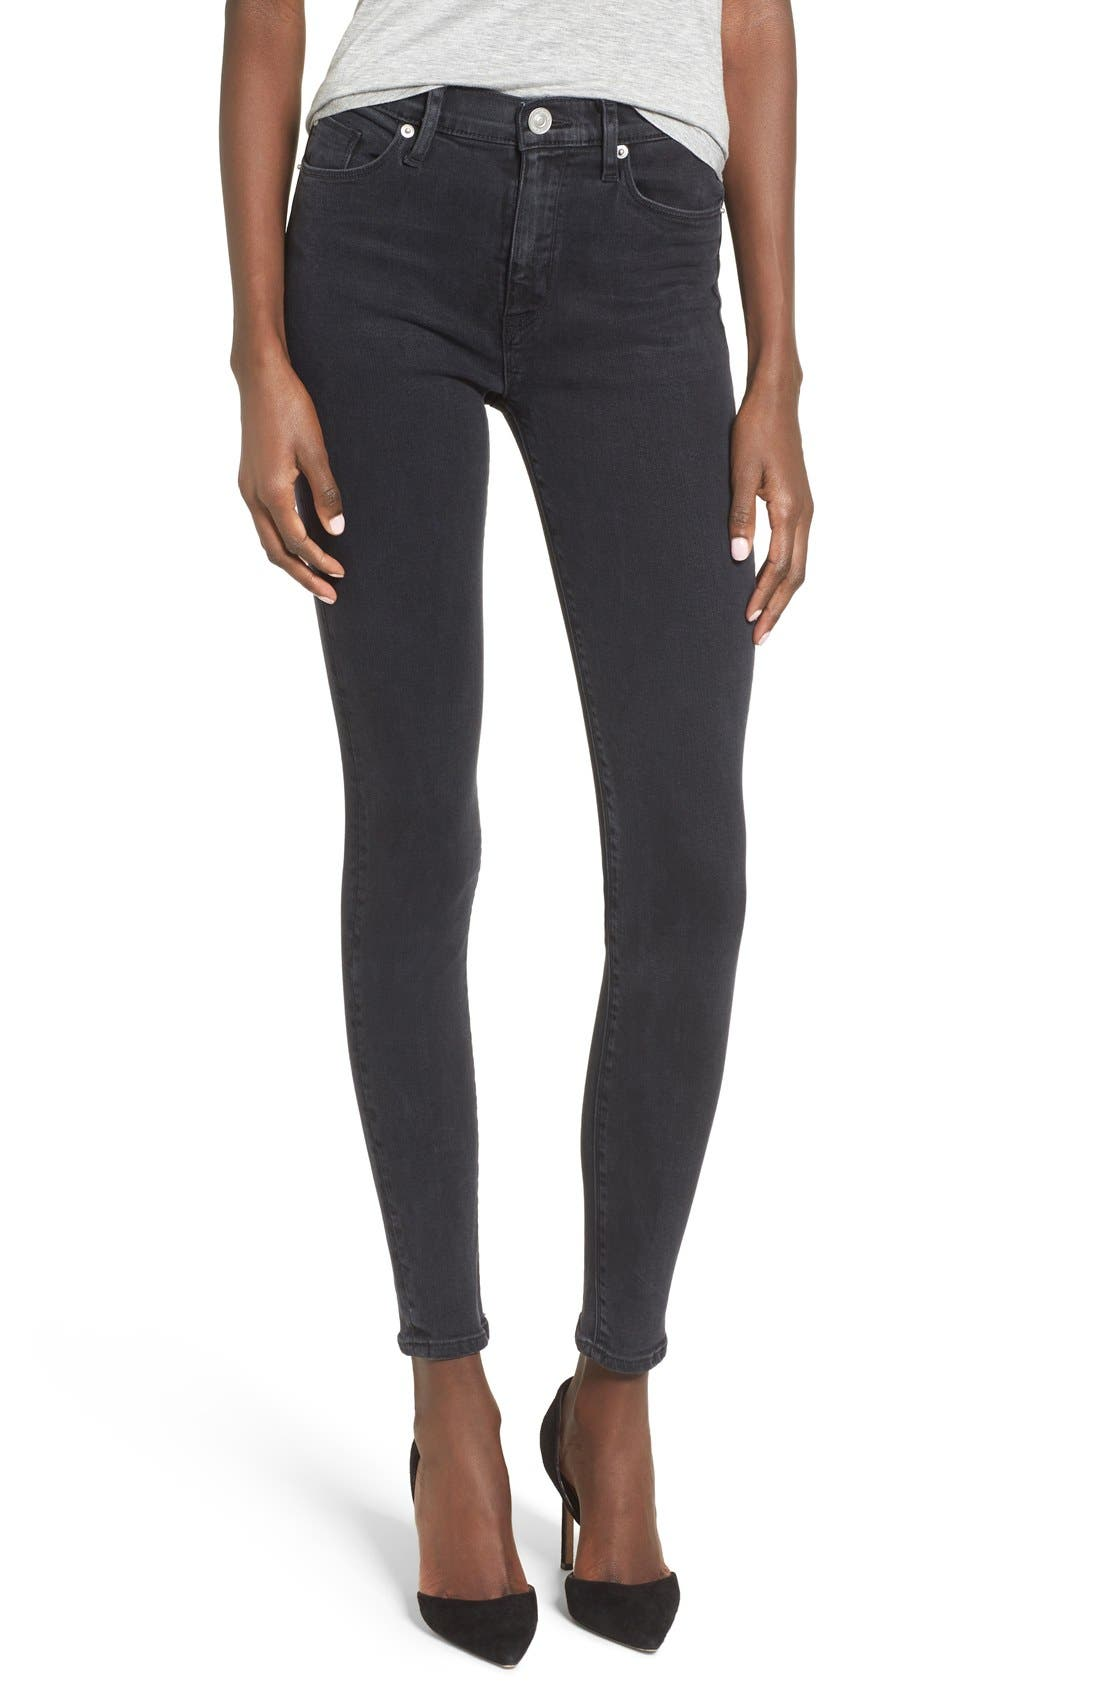 Main Image - Hudson Jeans Barbara High Waist Super Skinny Jeans (Bazooka)